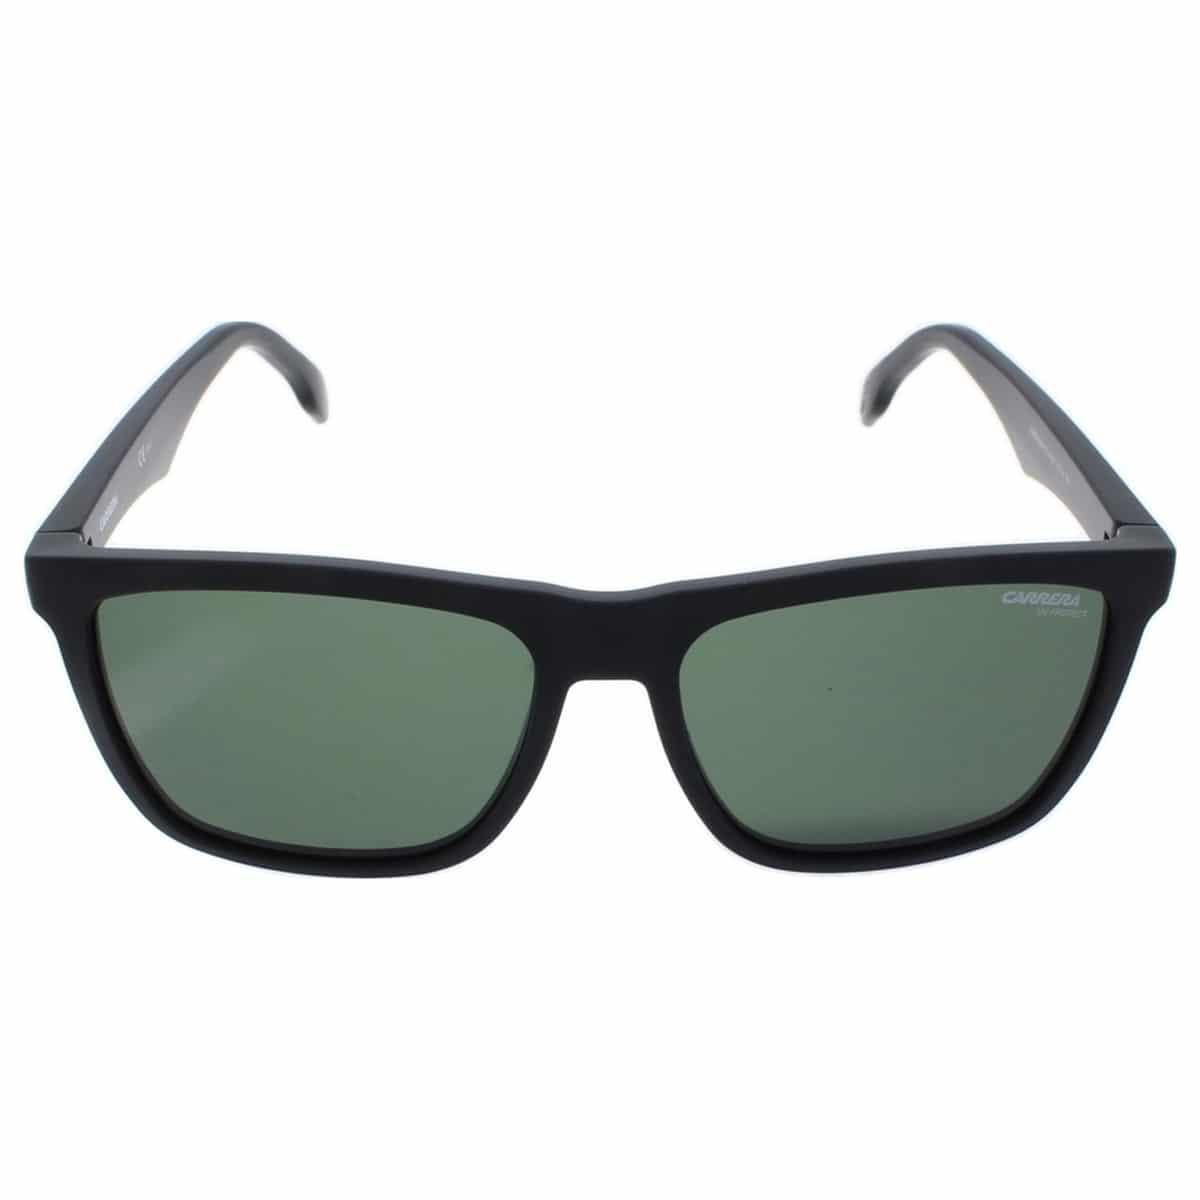 a16c13b7d2c Carrera UV Protected Wayfarer Unisex Sunglasses 5041 S00356QT ...